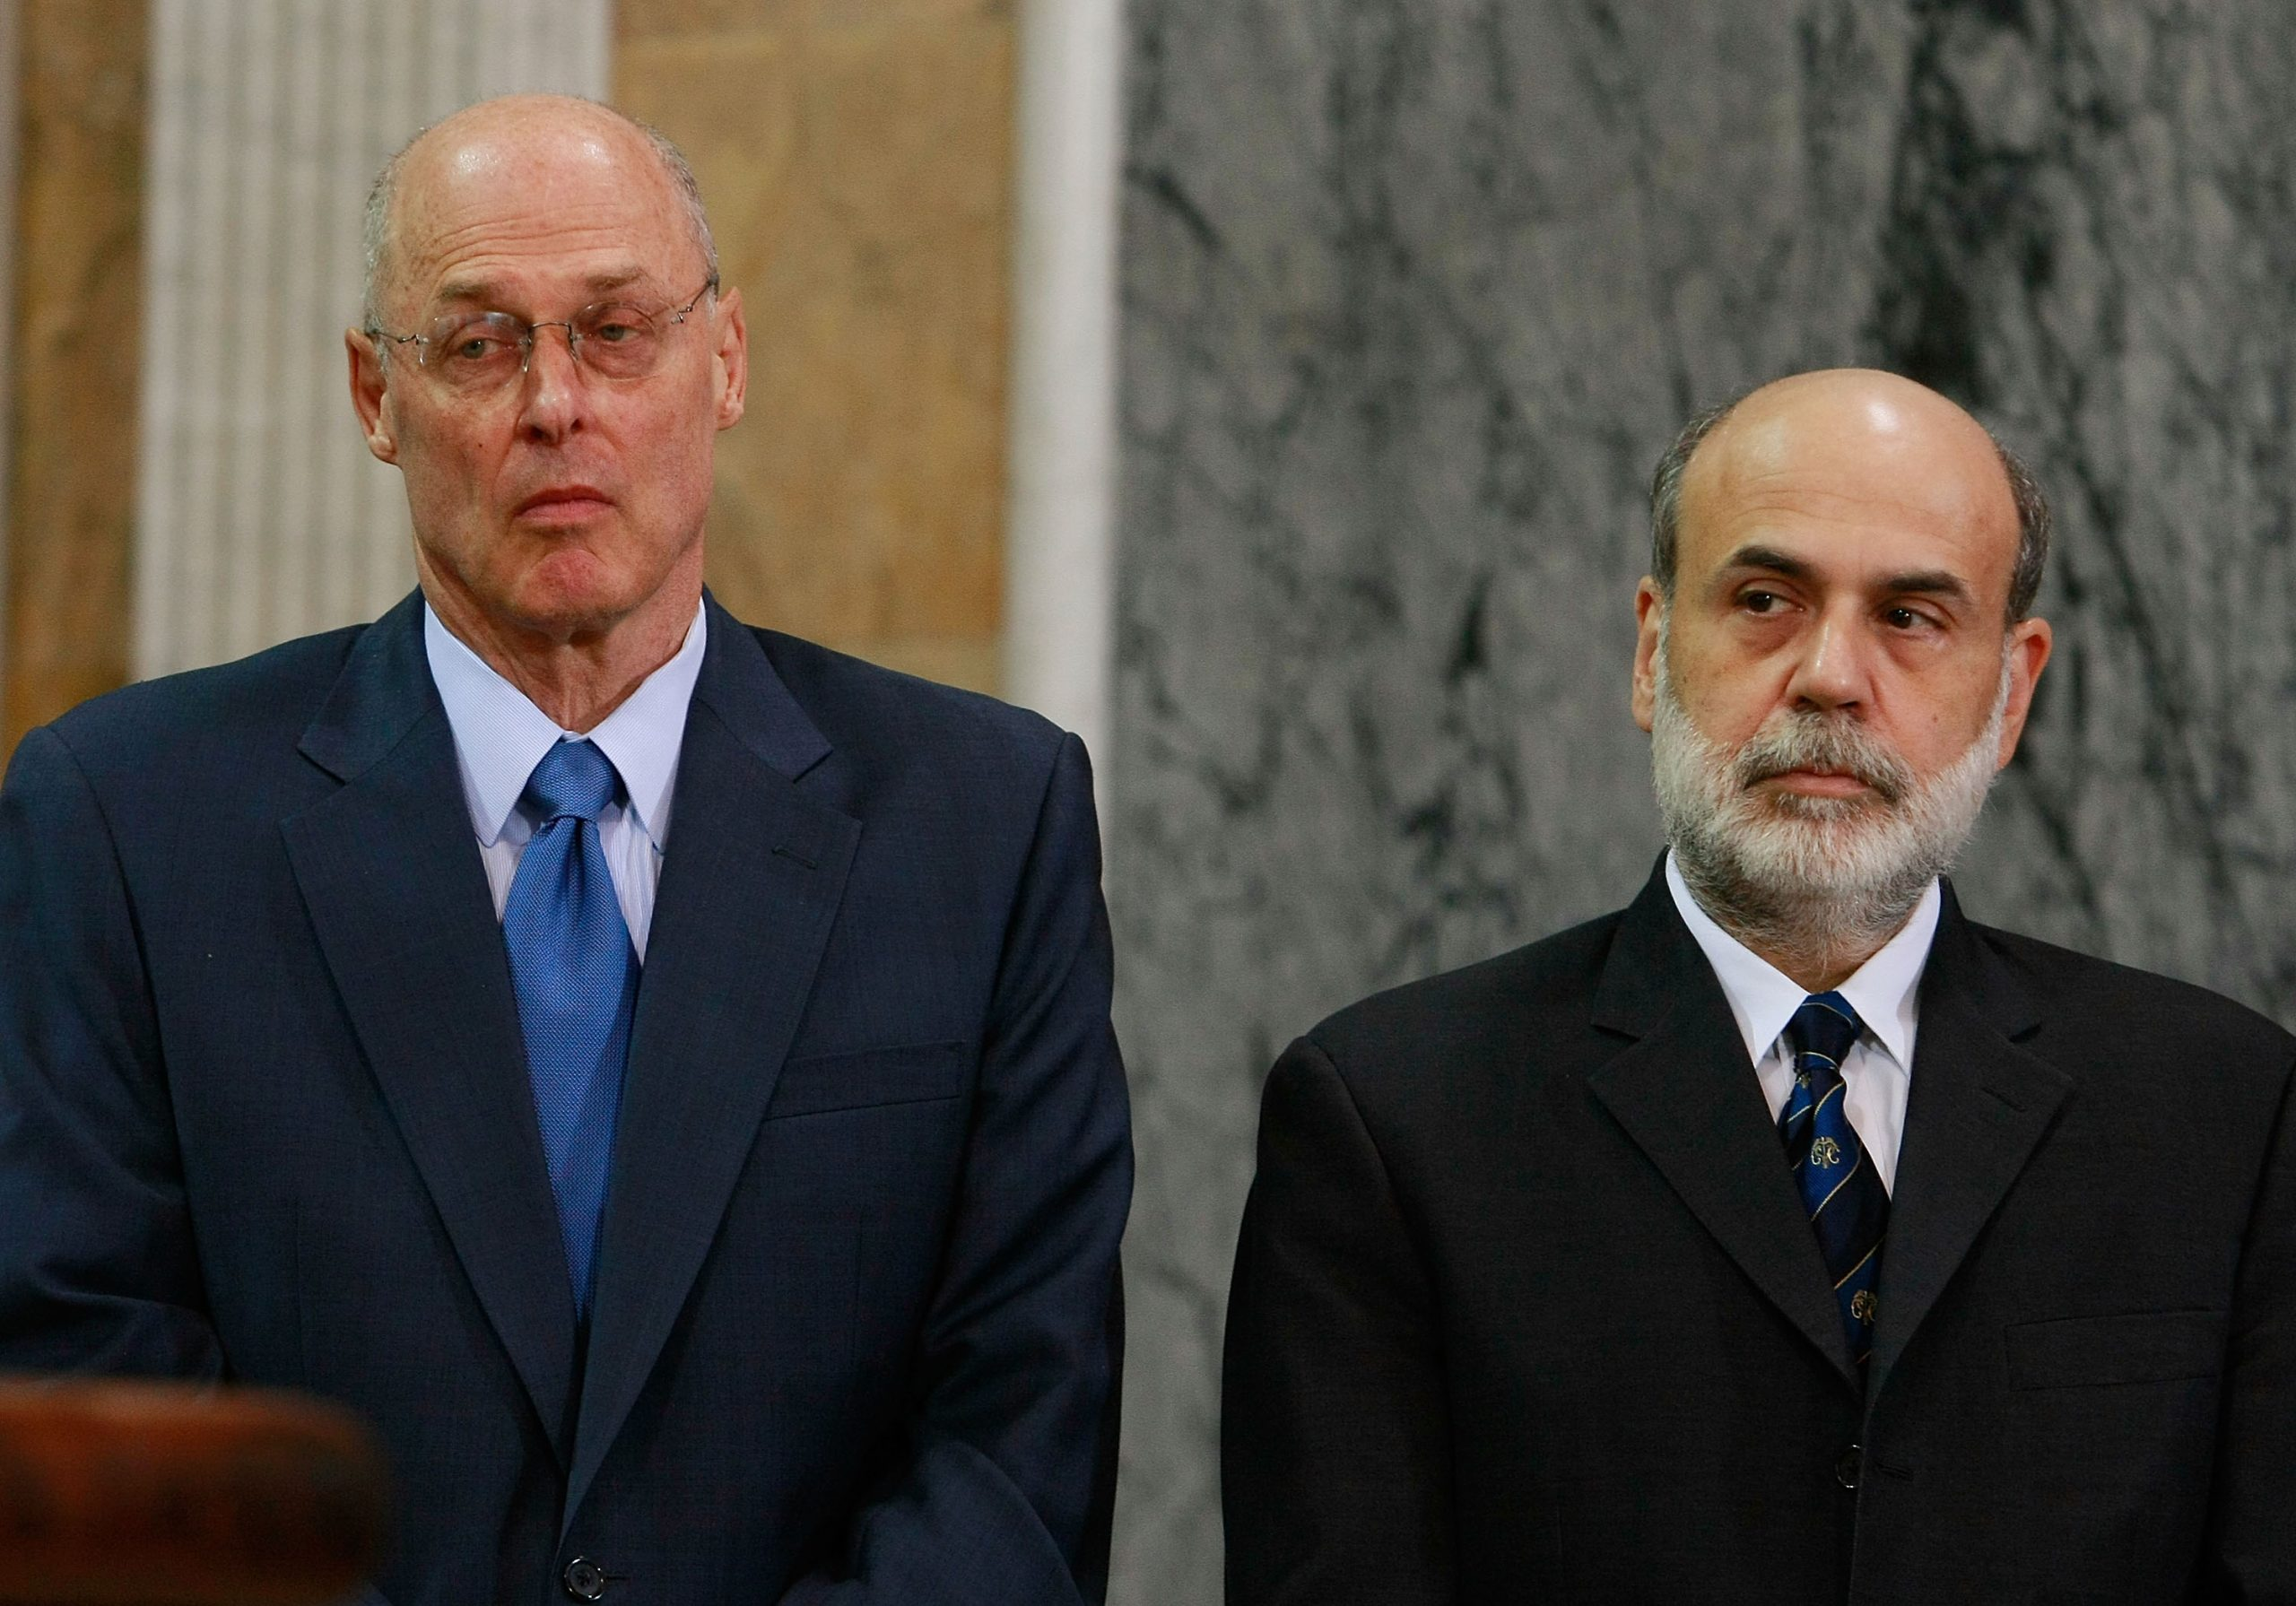 Paulson, Bernanke, And FDIC Chairman Make Statement On Financial Markets